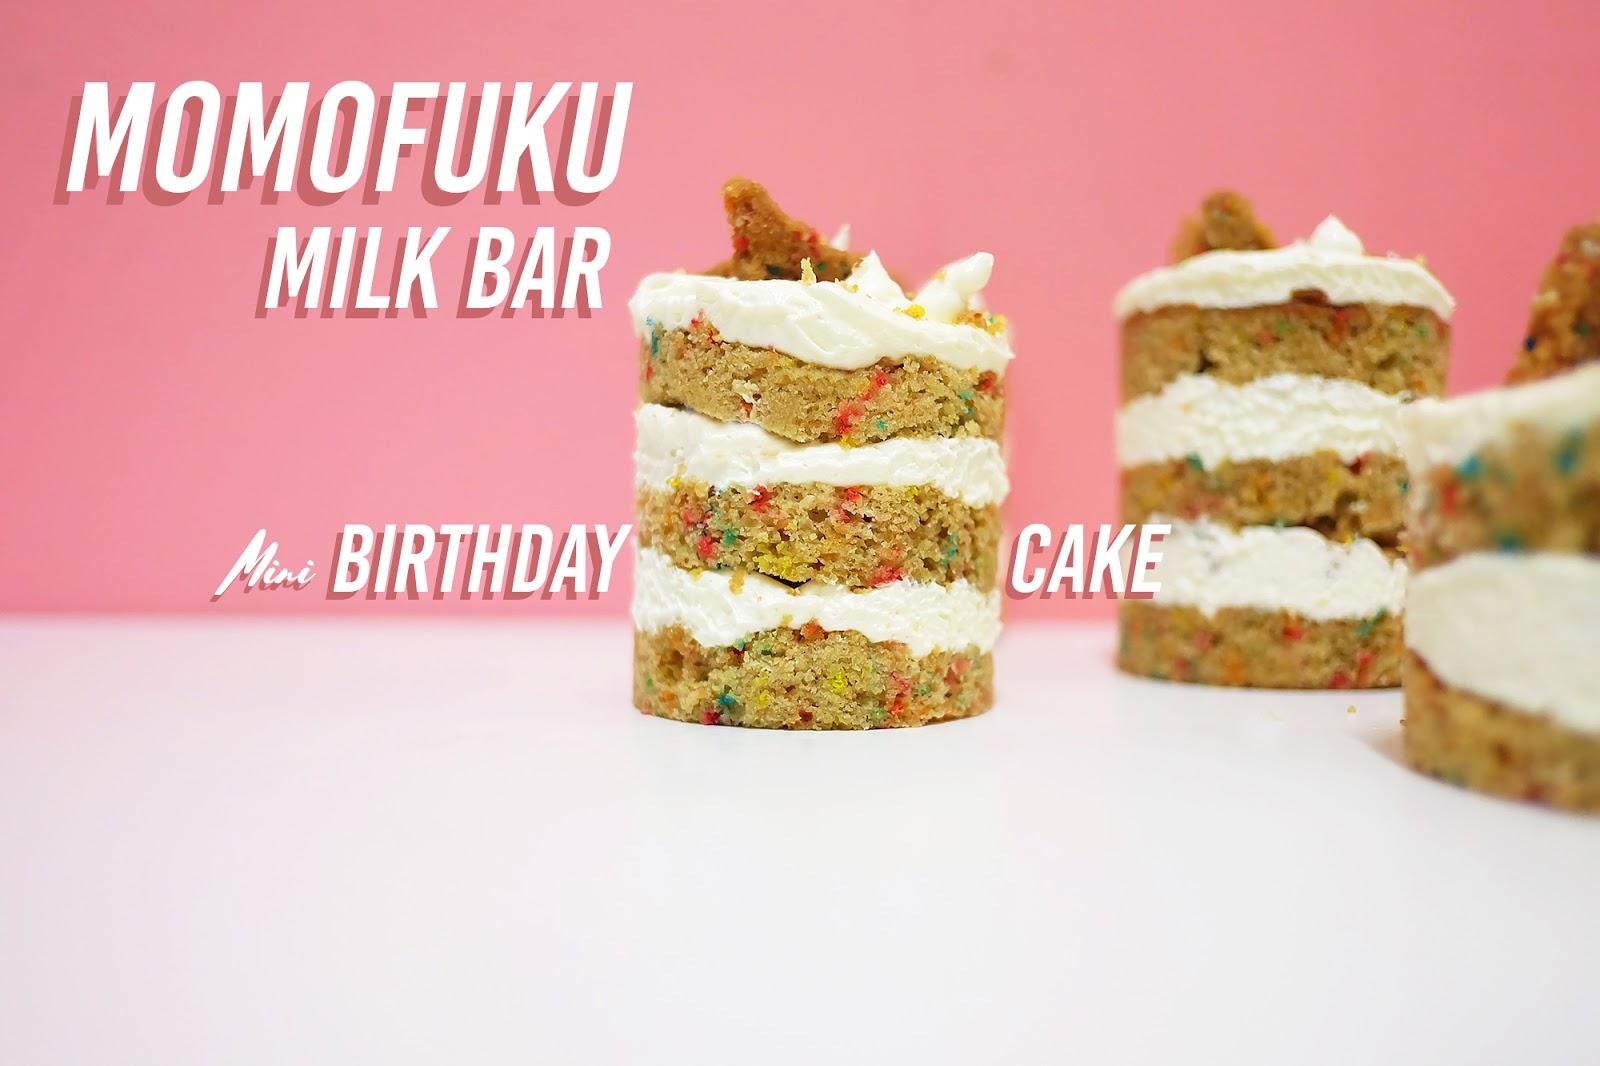 Momofuku Milk Bar Birthday Cake Apron and Cream